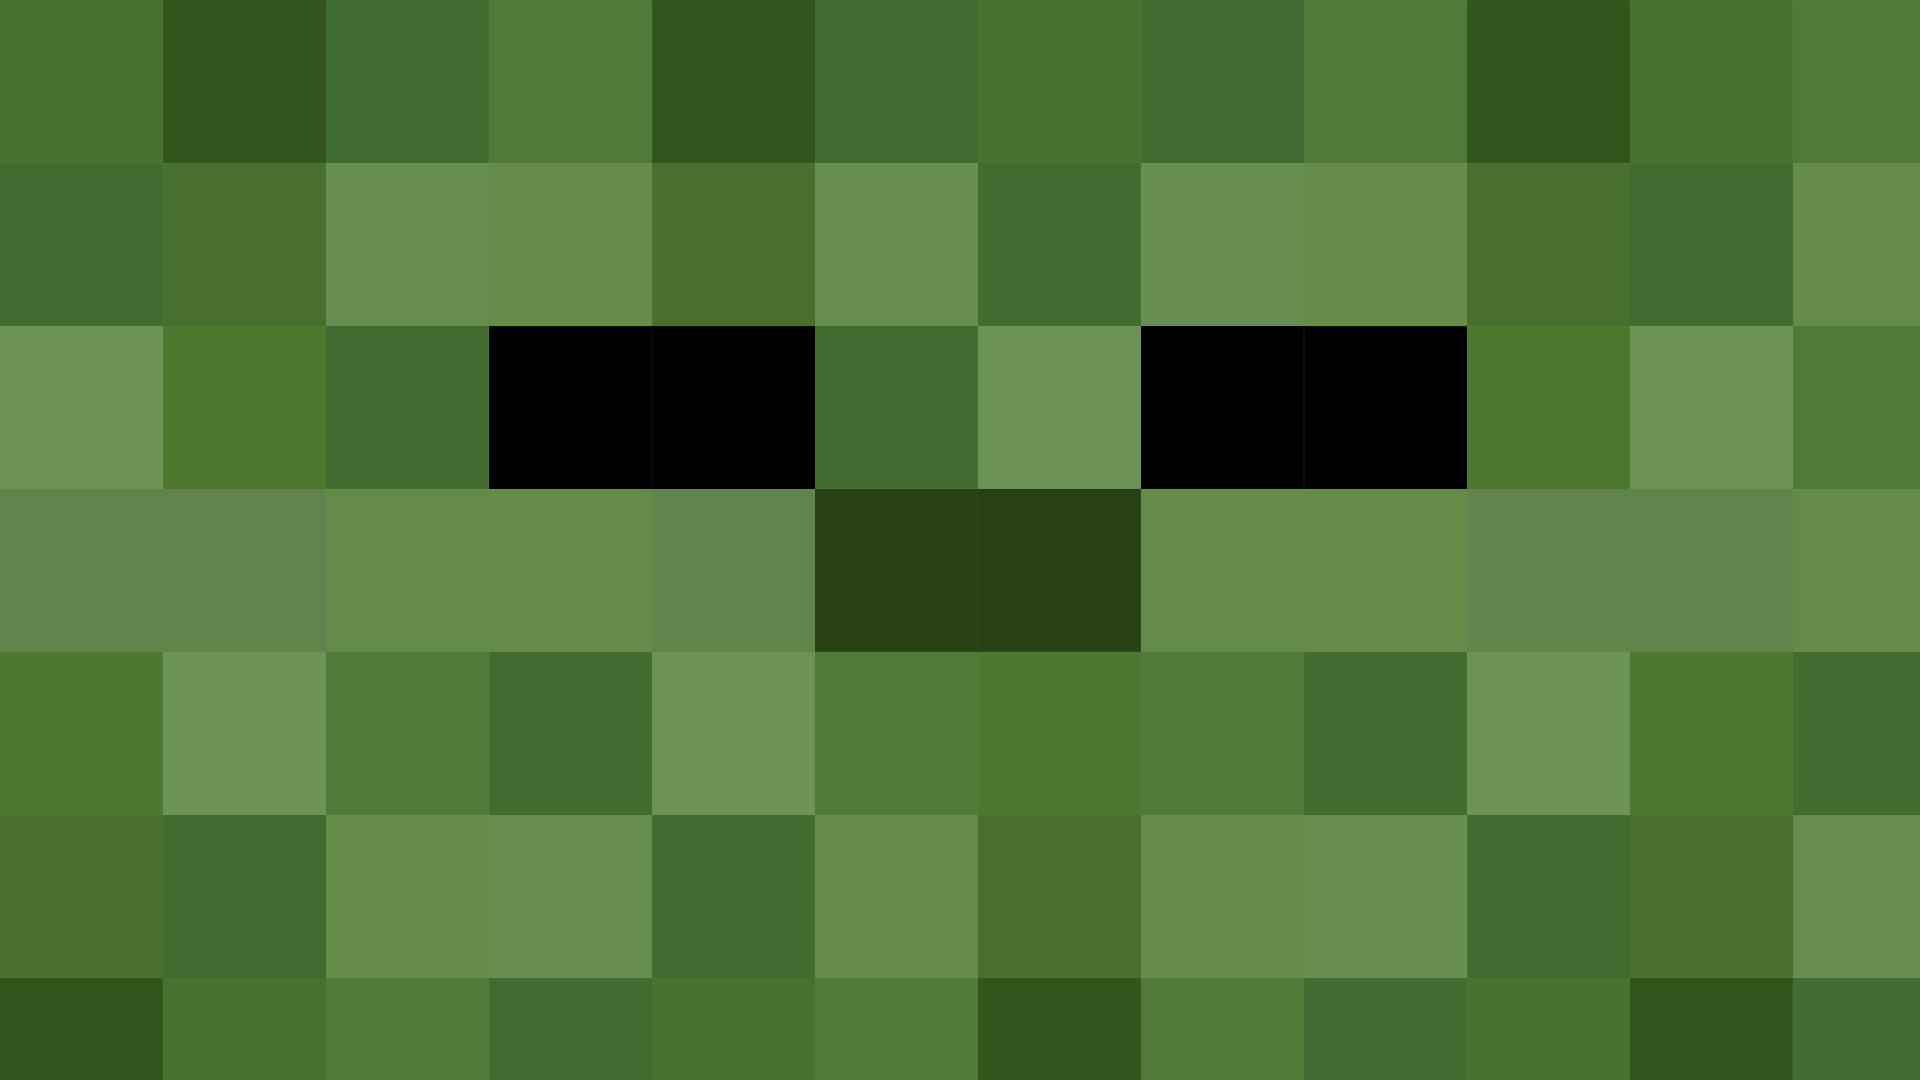 HD Minecraft Zombie Wallpaper by Karl